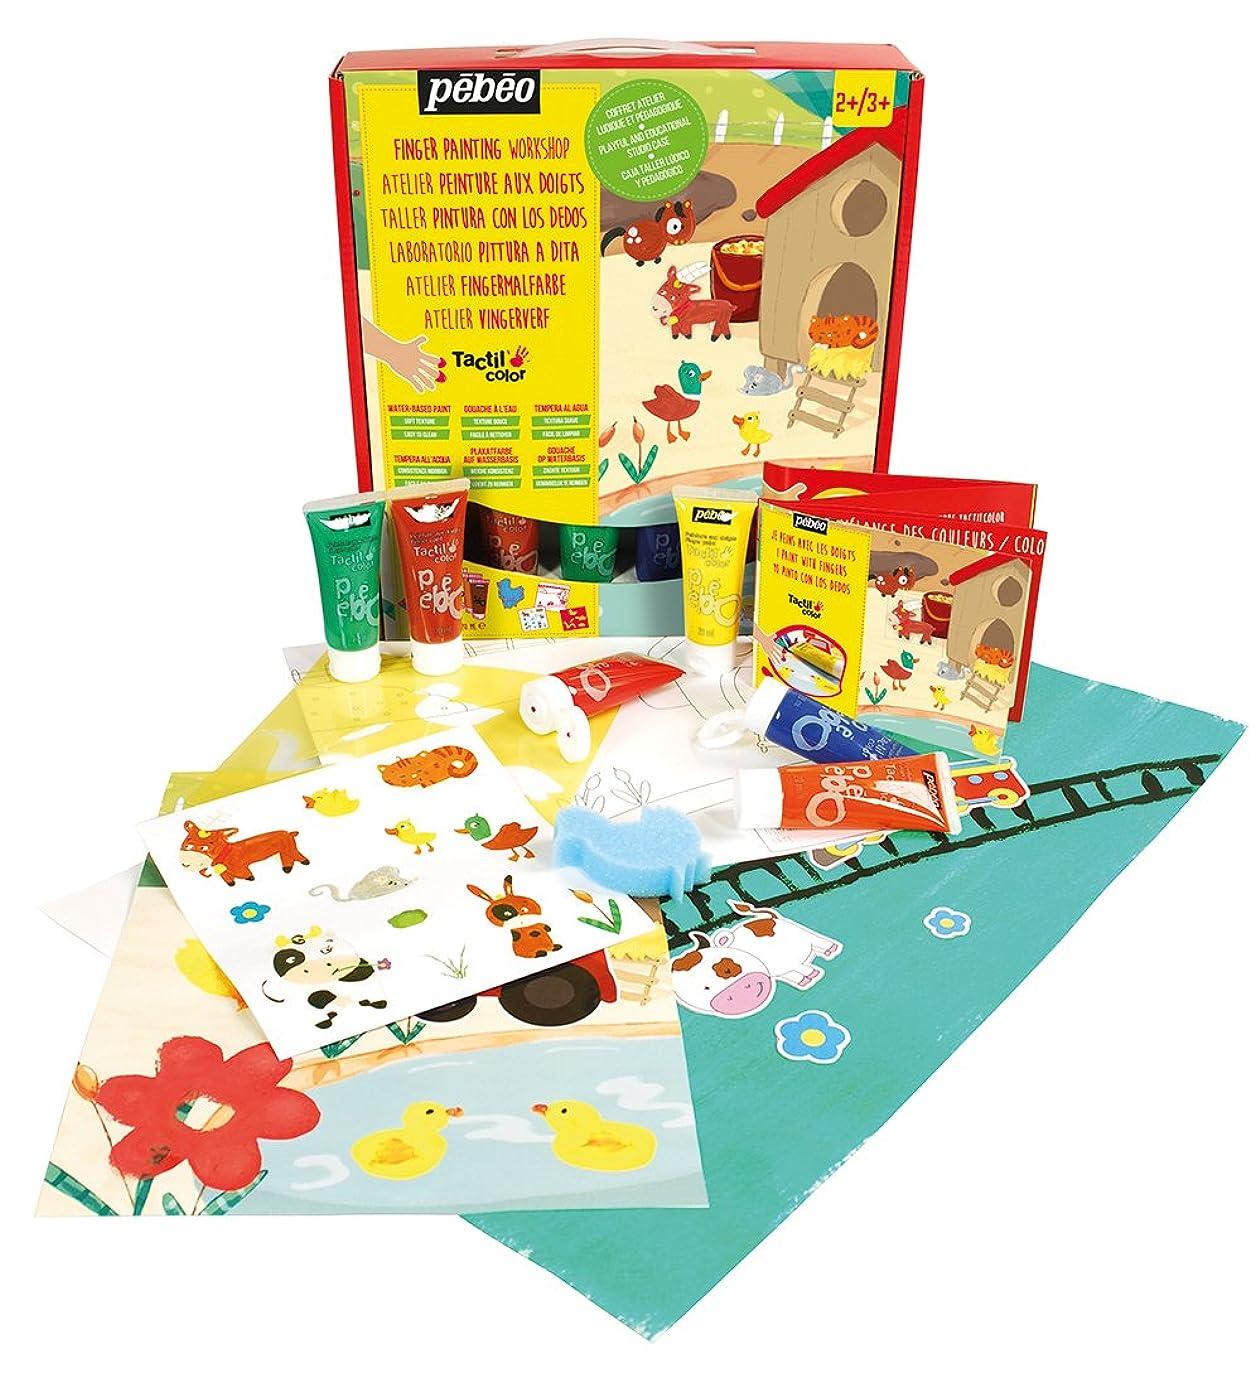 PEBEO 635805 Studio Tactilcolor Art Paint Kit, 6 x 20ml